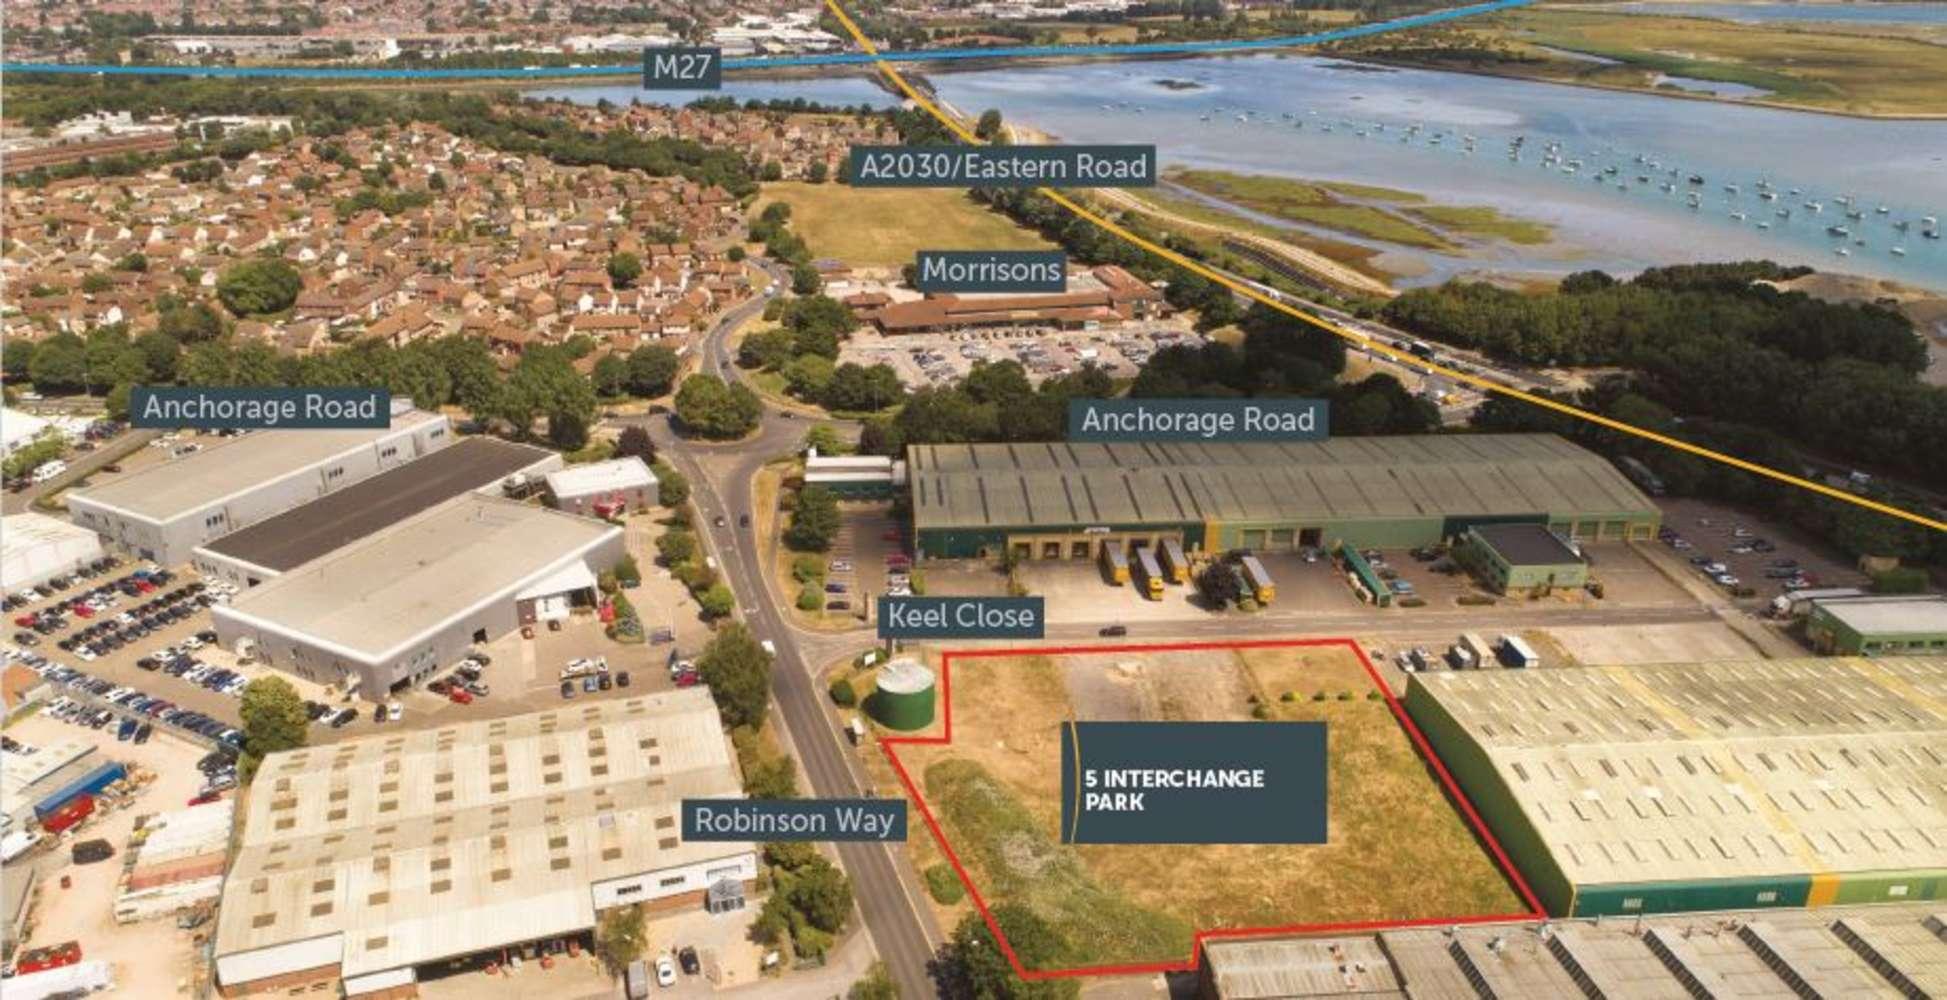 Industrial and logistics Portsmouth, PO3 5QD - 5 Interchange Park - 84298